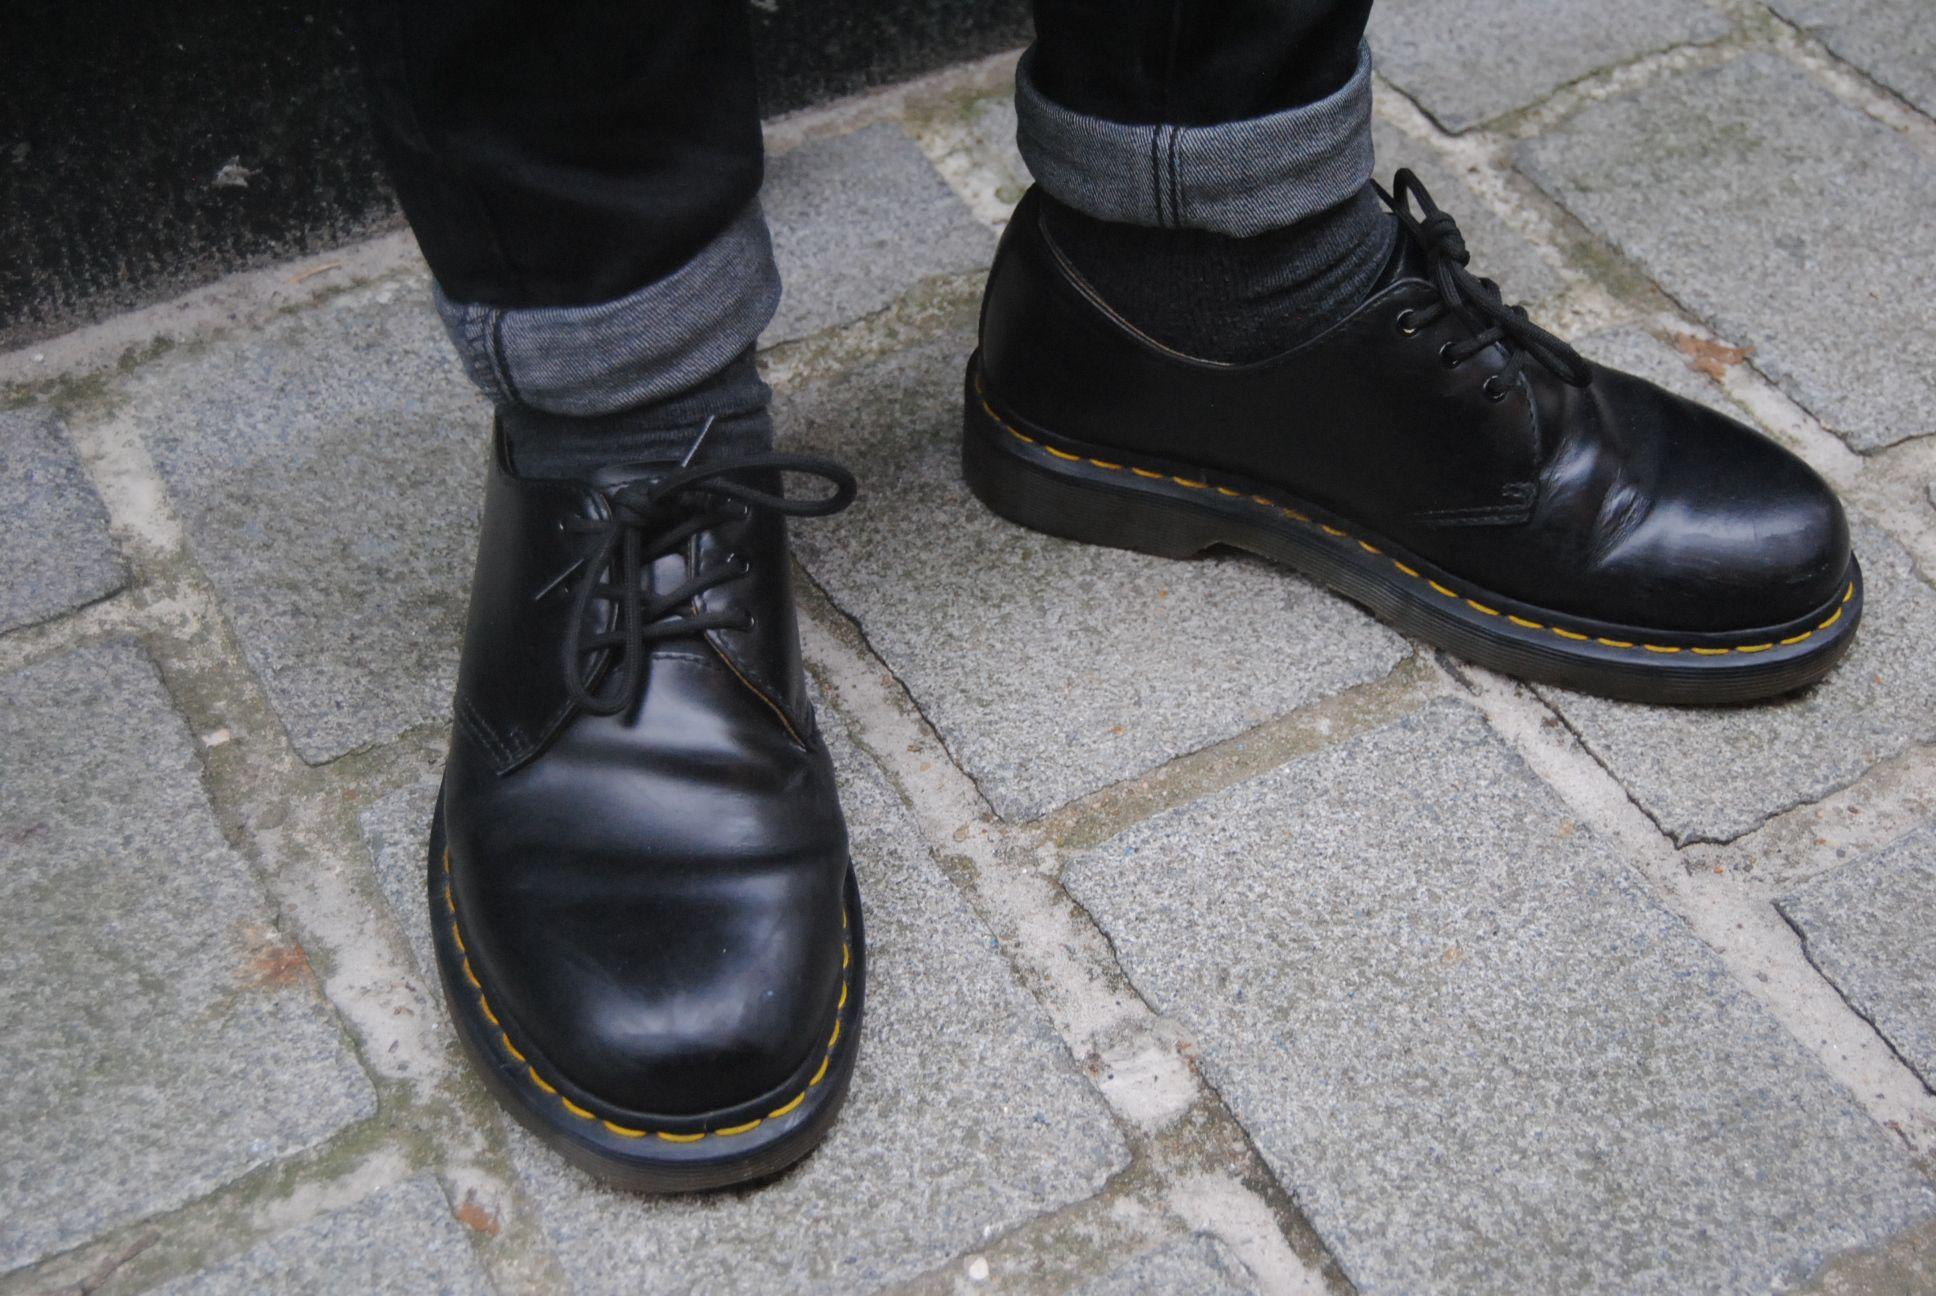 Henry wearing Black 1461s Doc Martens Black 0b23ea81665